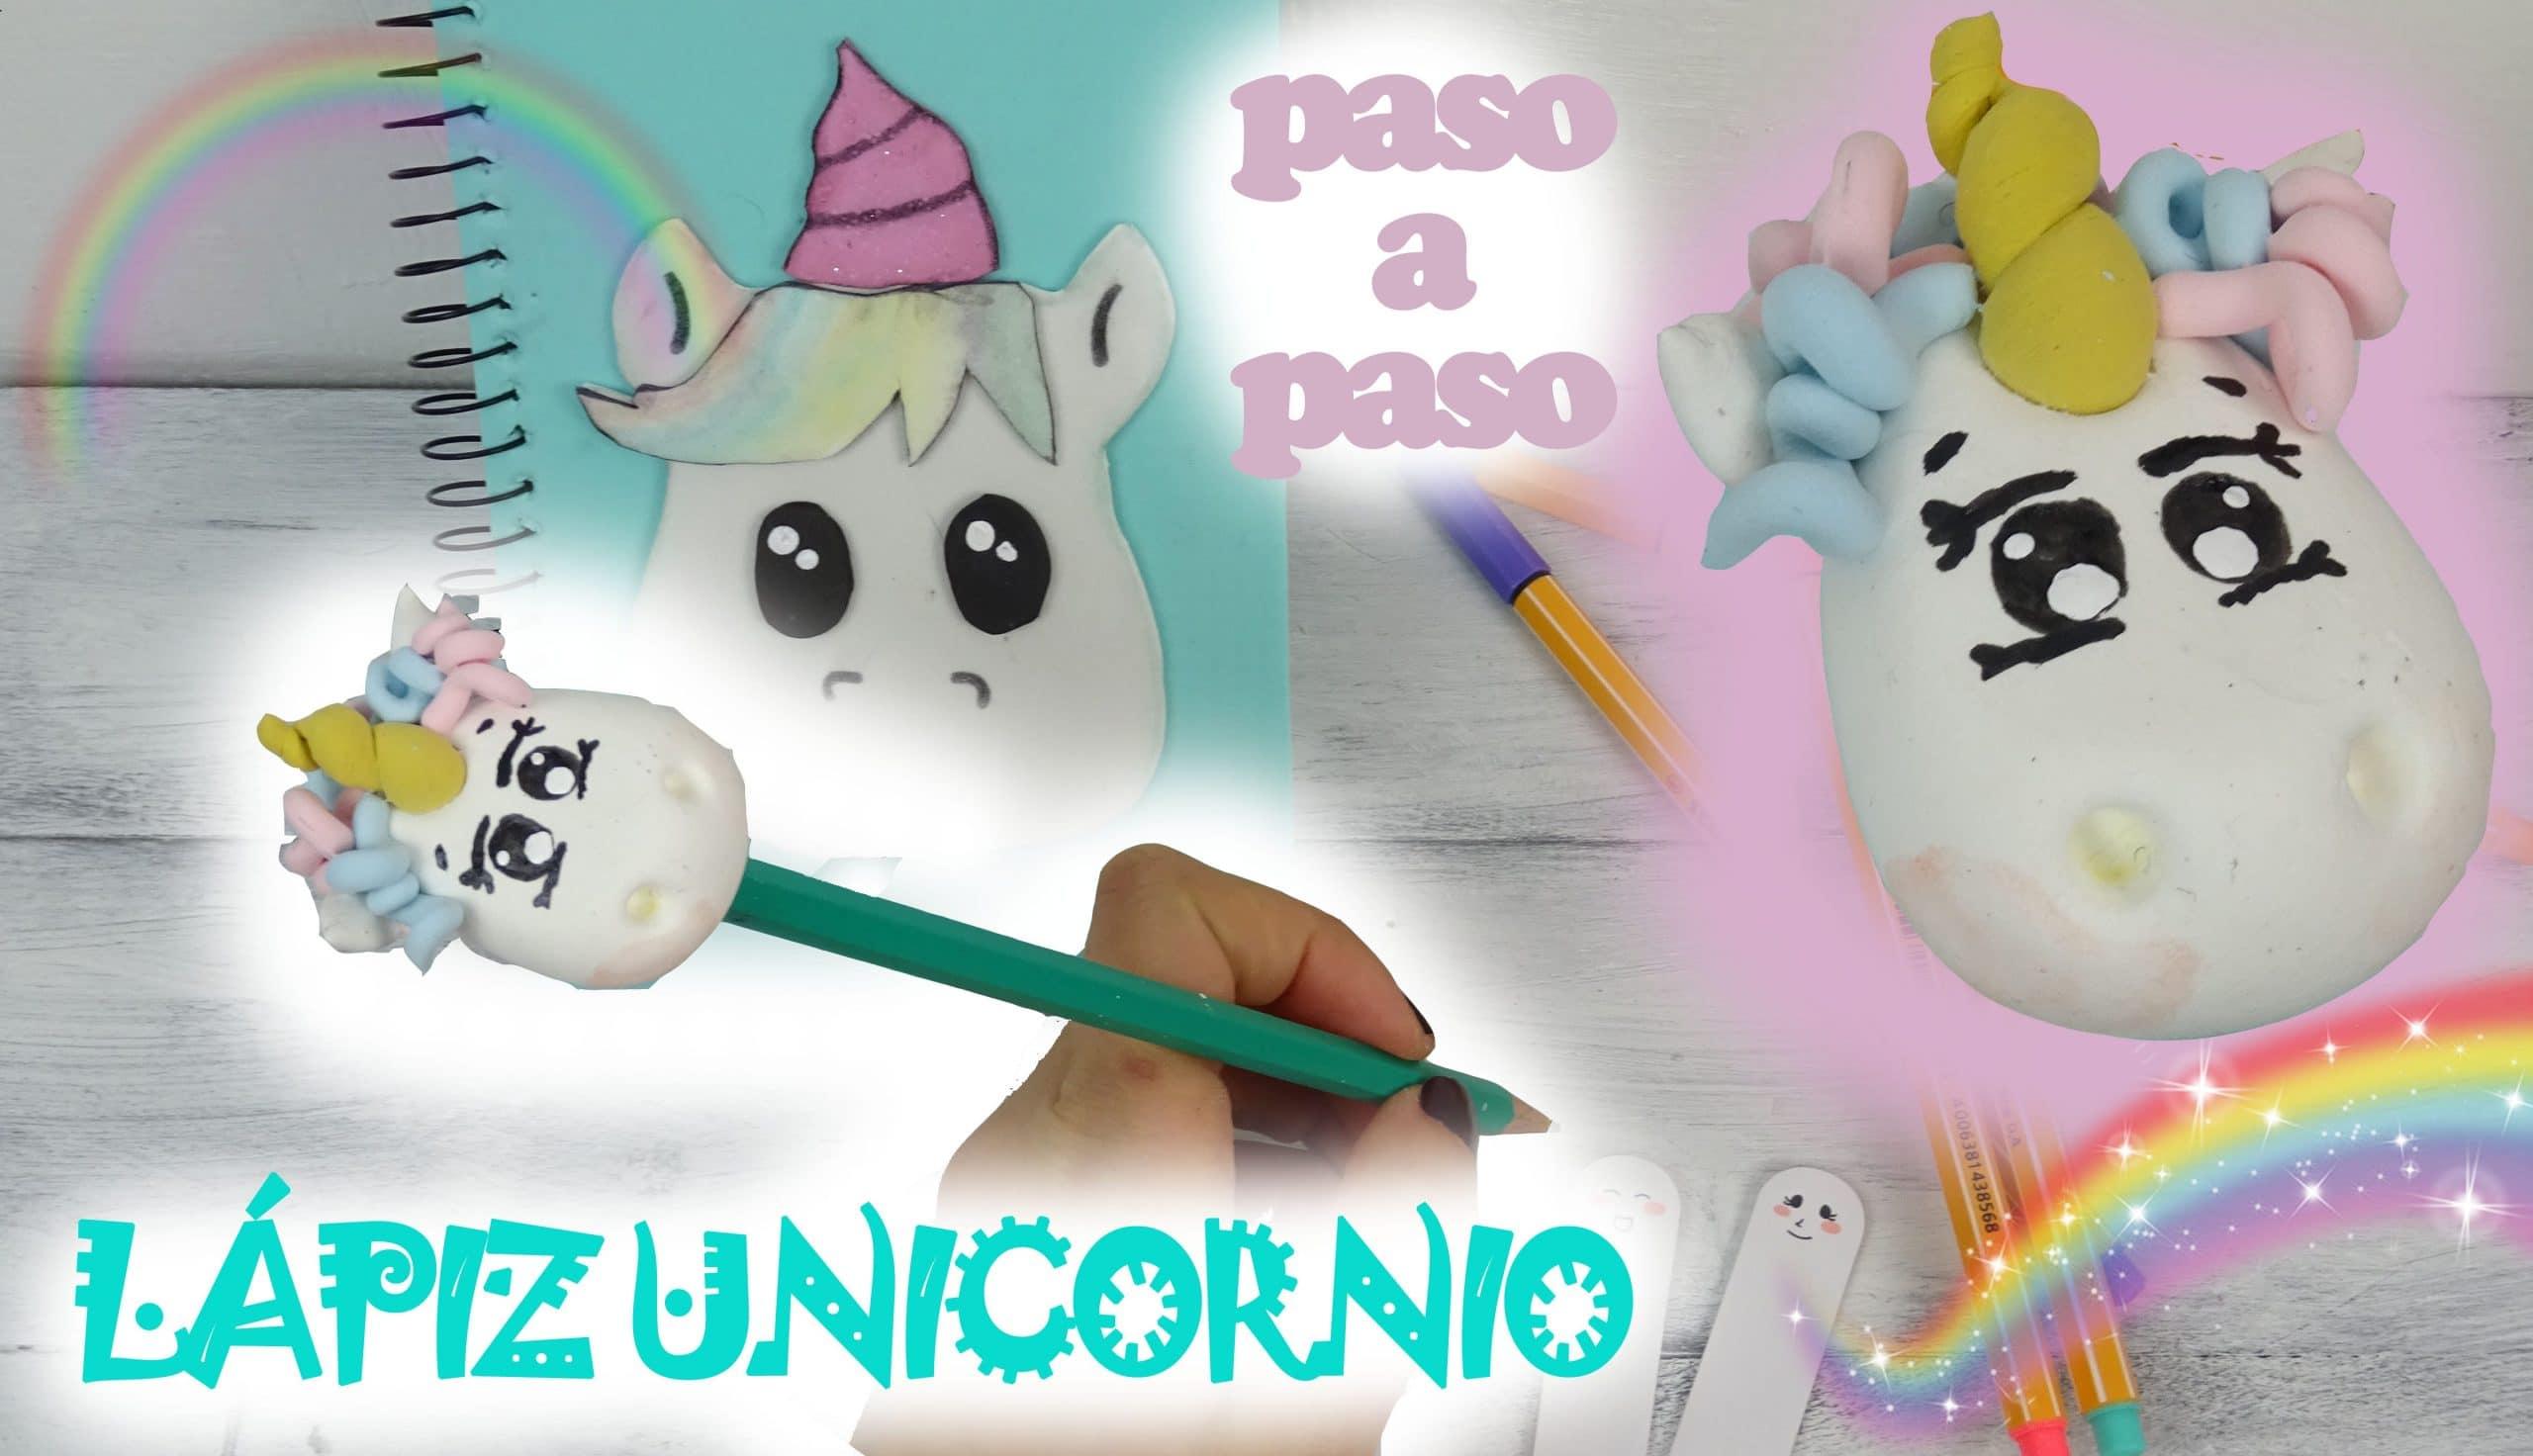 O Cómo Lápiz Unicornio Con Arcilla Fimo De Polimérica Hacer Un F13lKJuTc